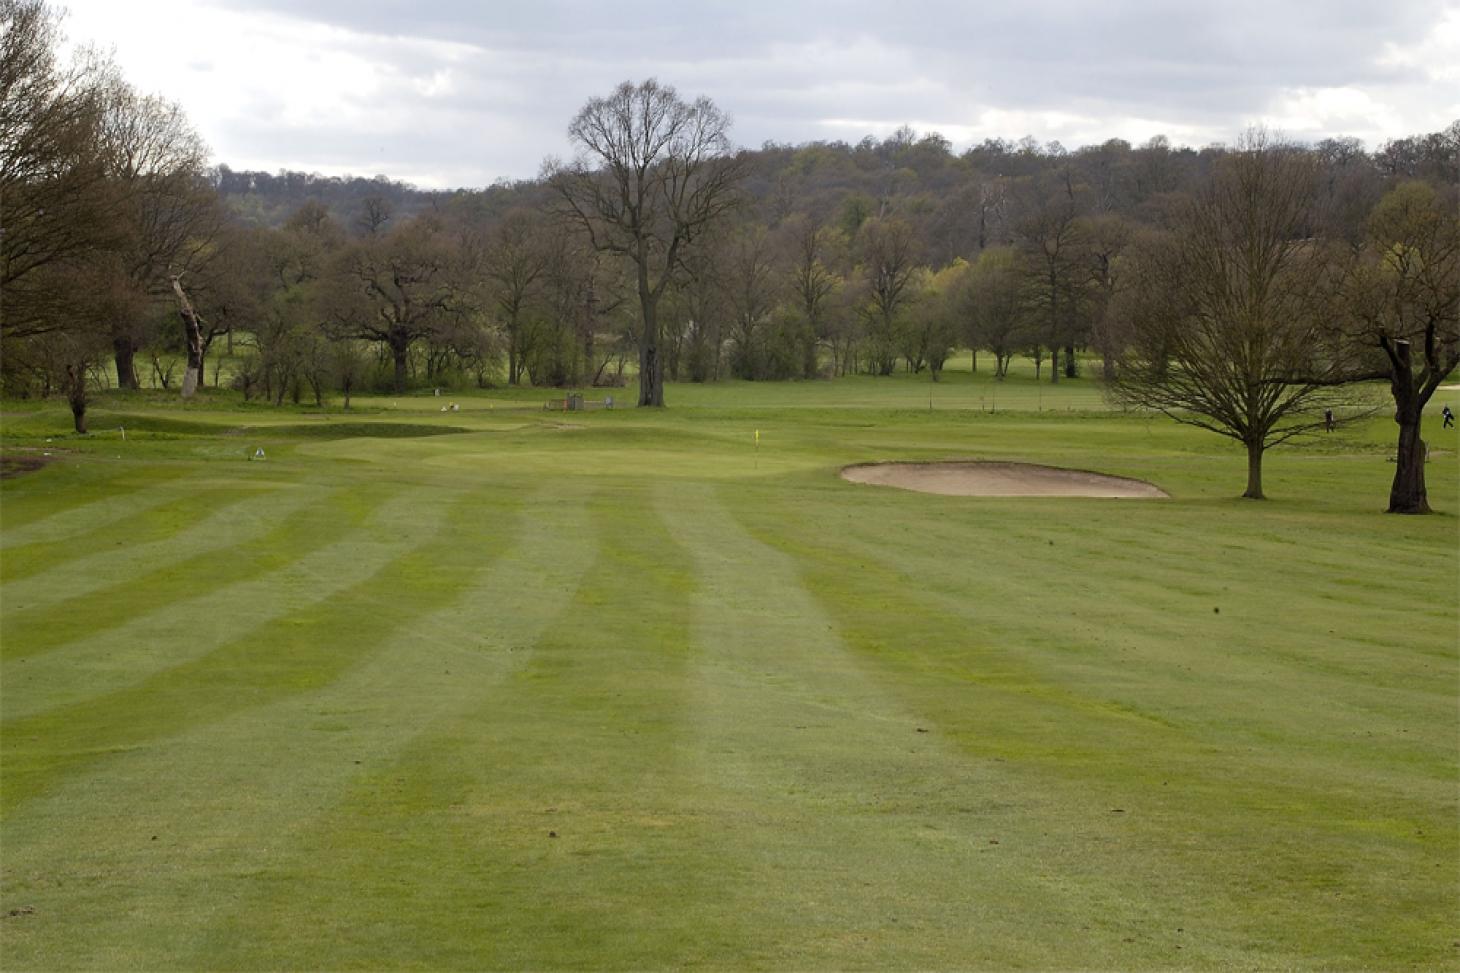 Richmond Park Golf Courses 18 hole golf course